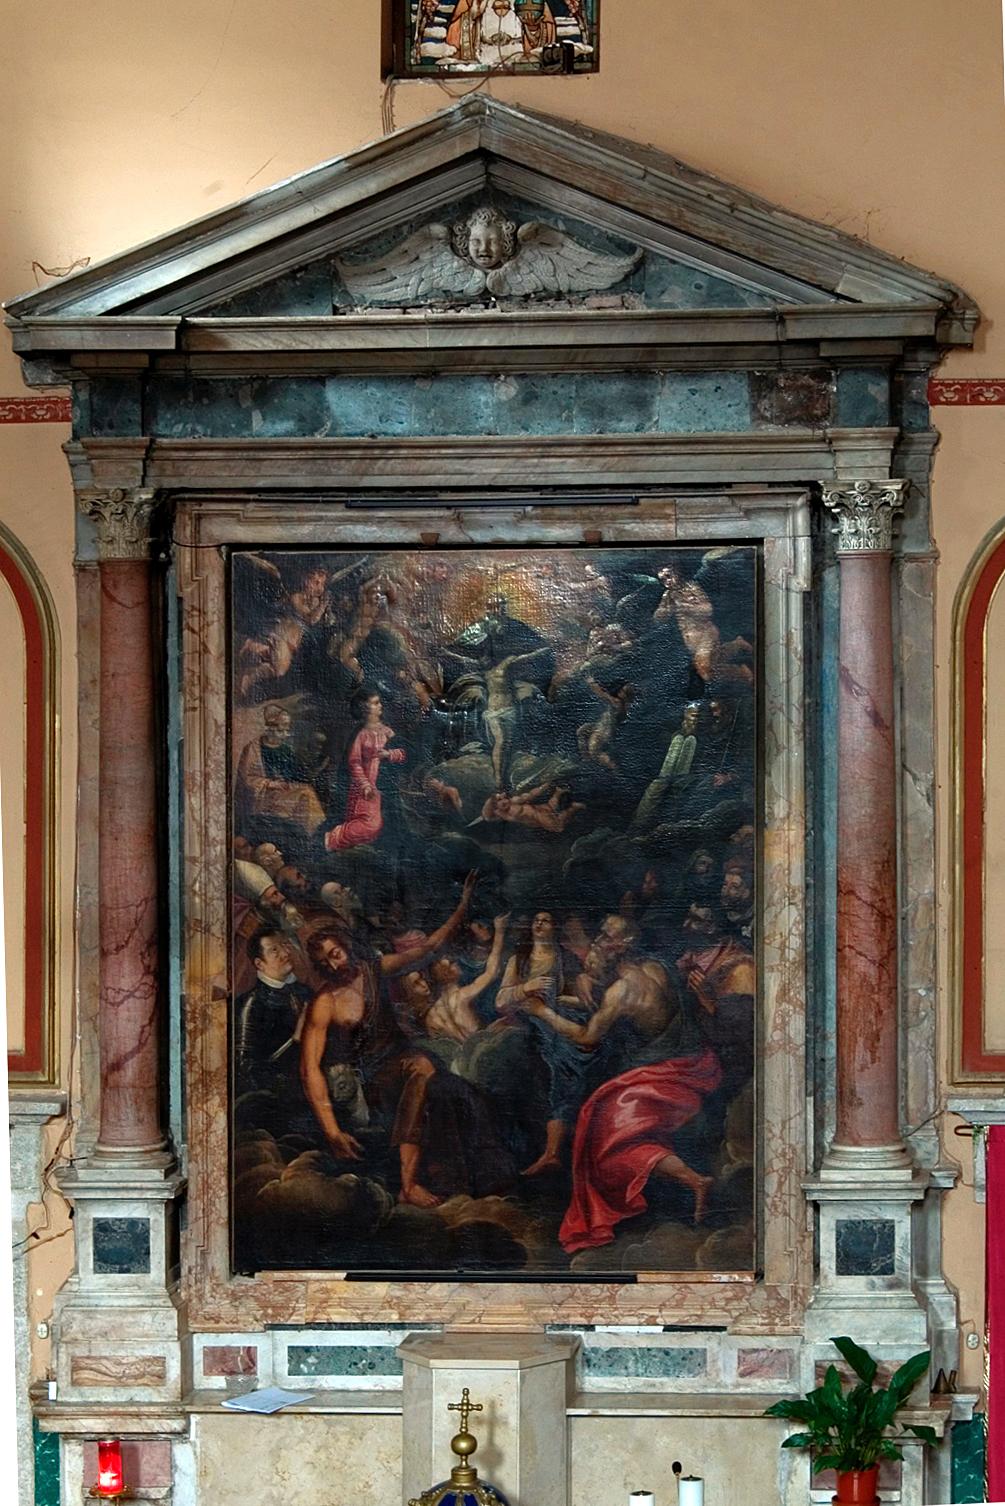 ill. 7: Santissima Trinità